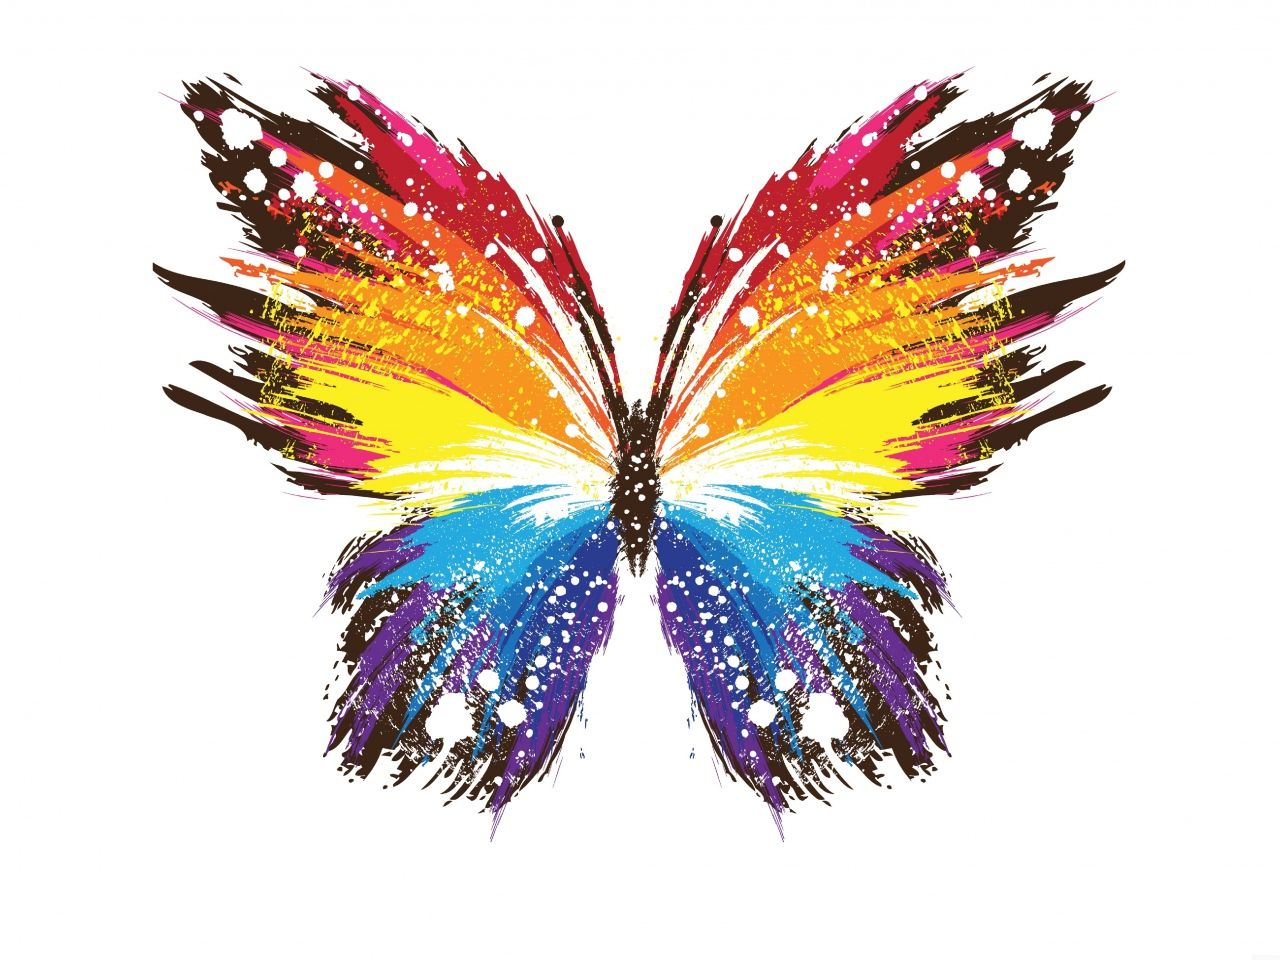 borboleta vetor - Pesquisa Google